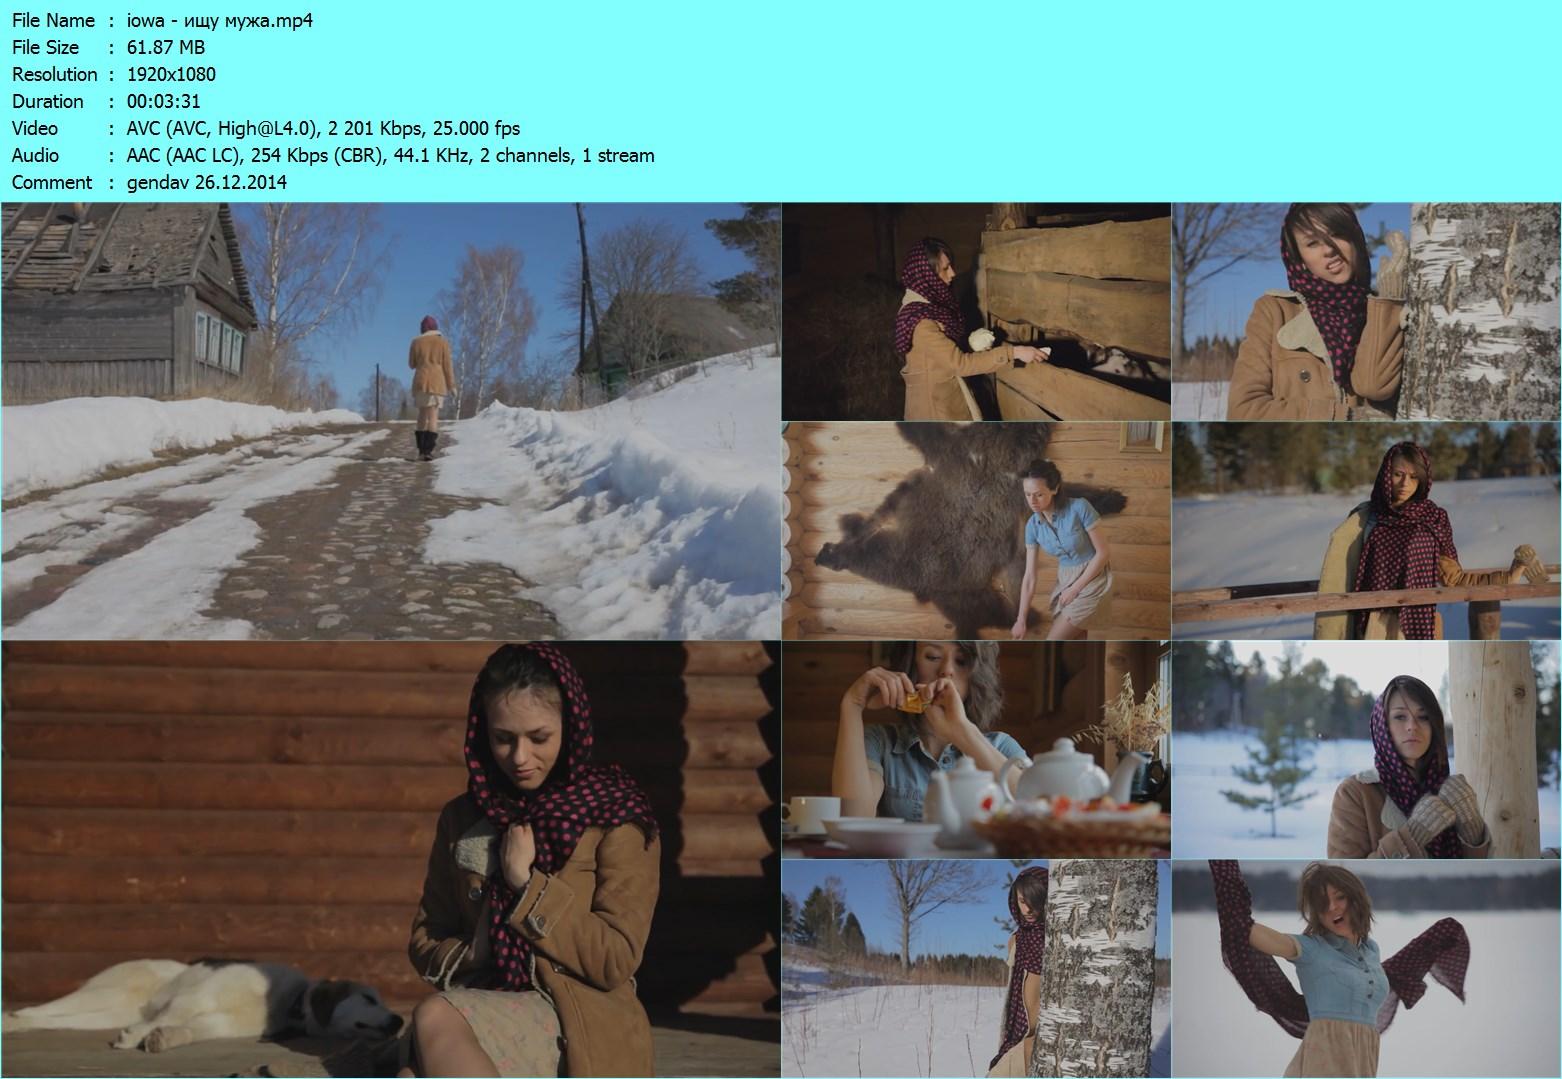 http://4put.ru/pictures/max/1051/3229876.jpg